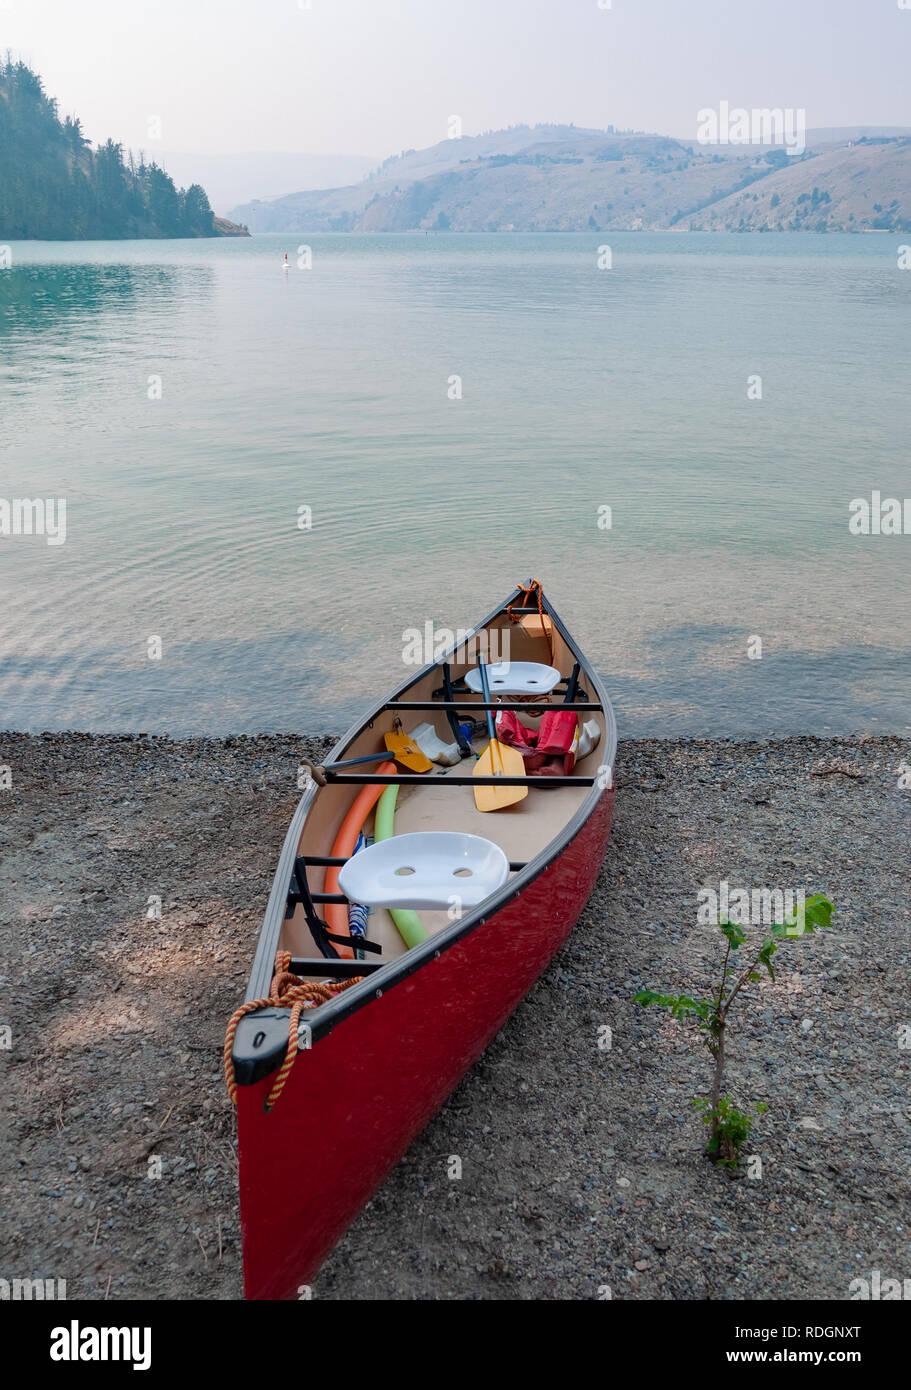 Lightweight Canoe Stock Photos & Lightweight Canoe Stock